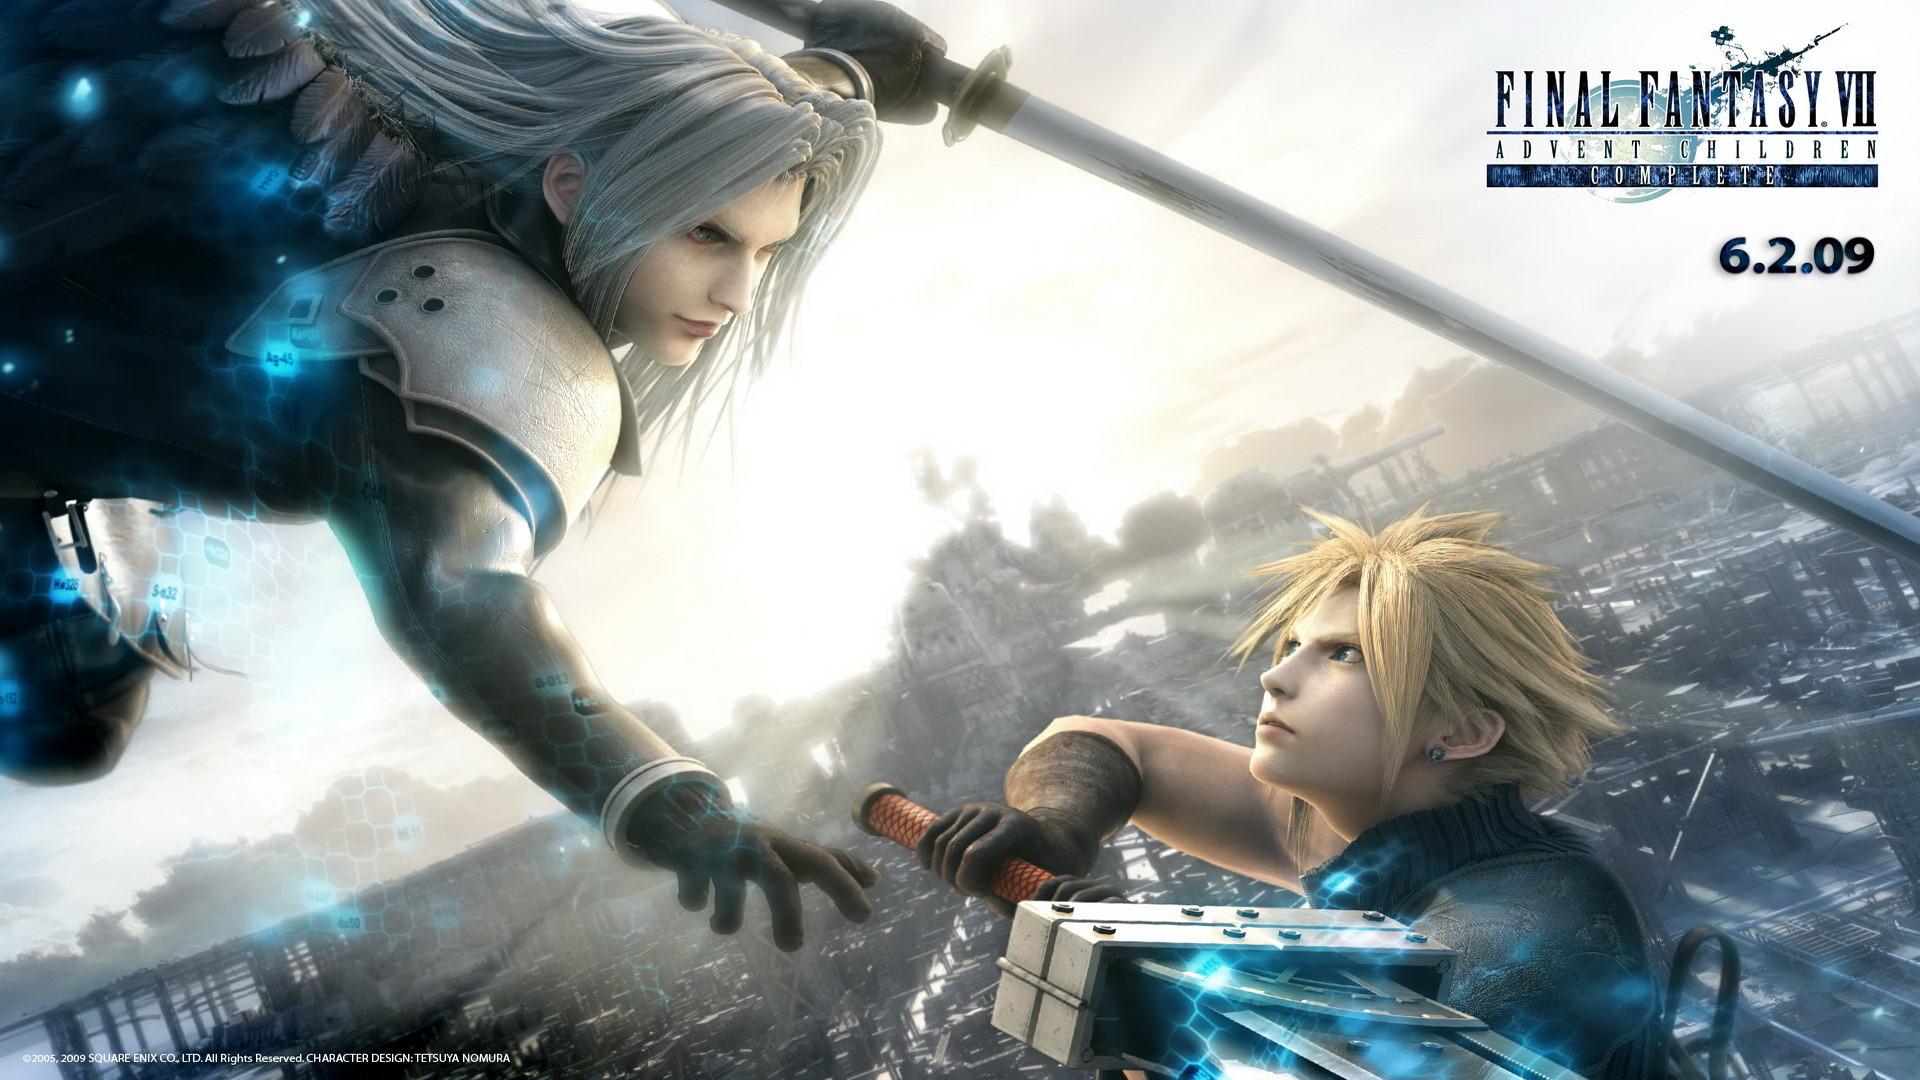 Final Fantasy VII Advent Children Wallpapers, Full HD 1080p | HD .